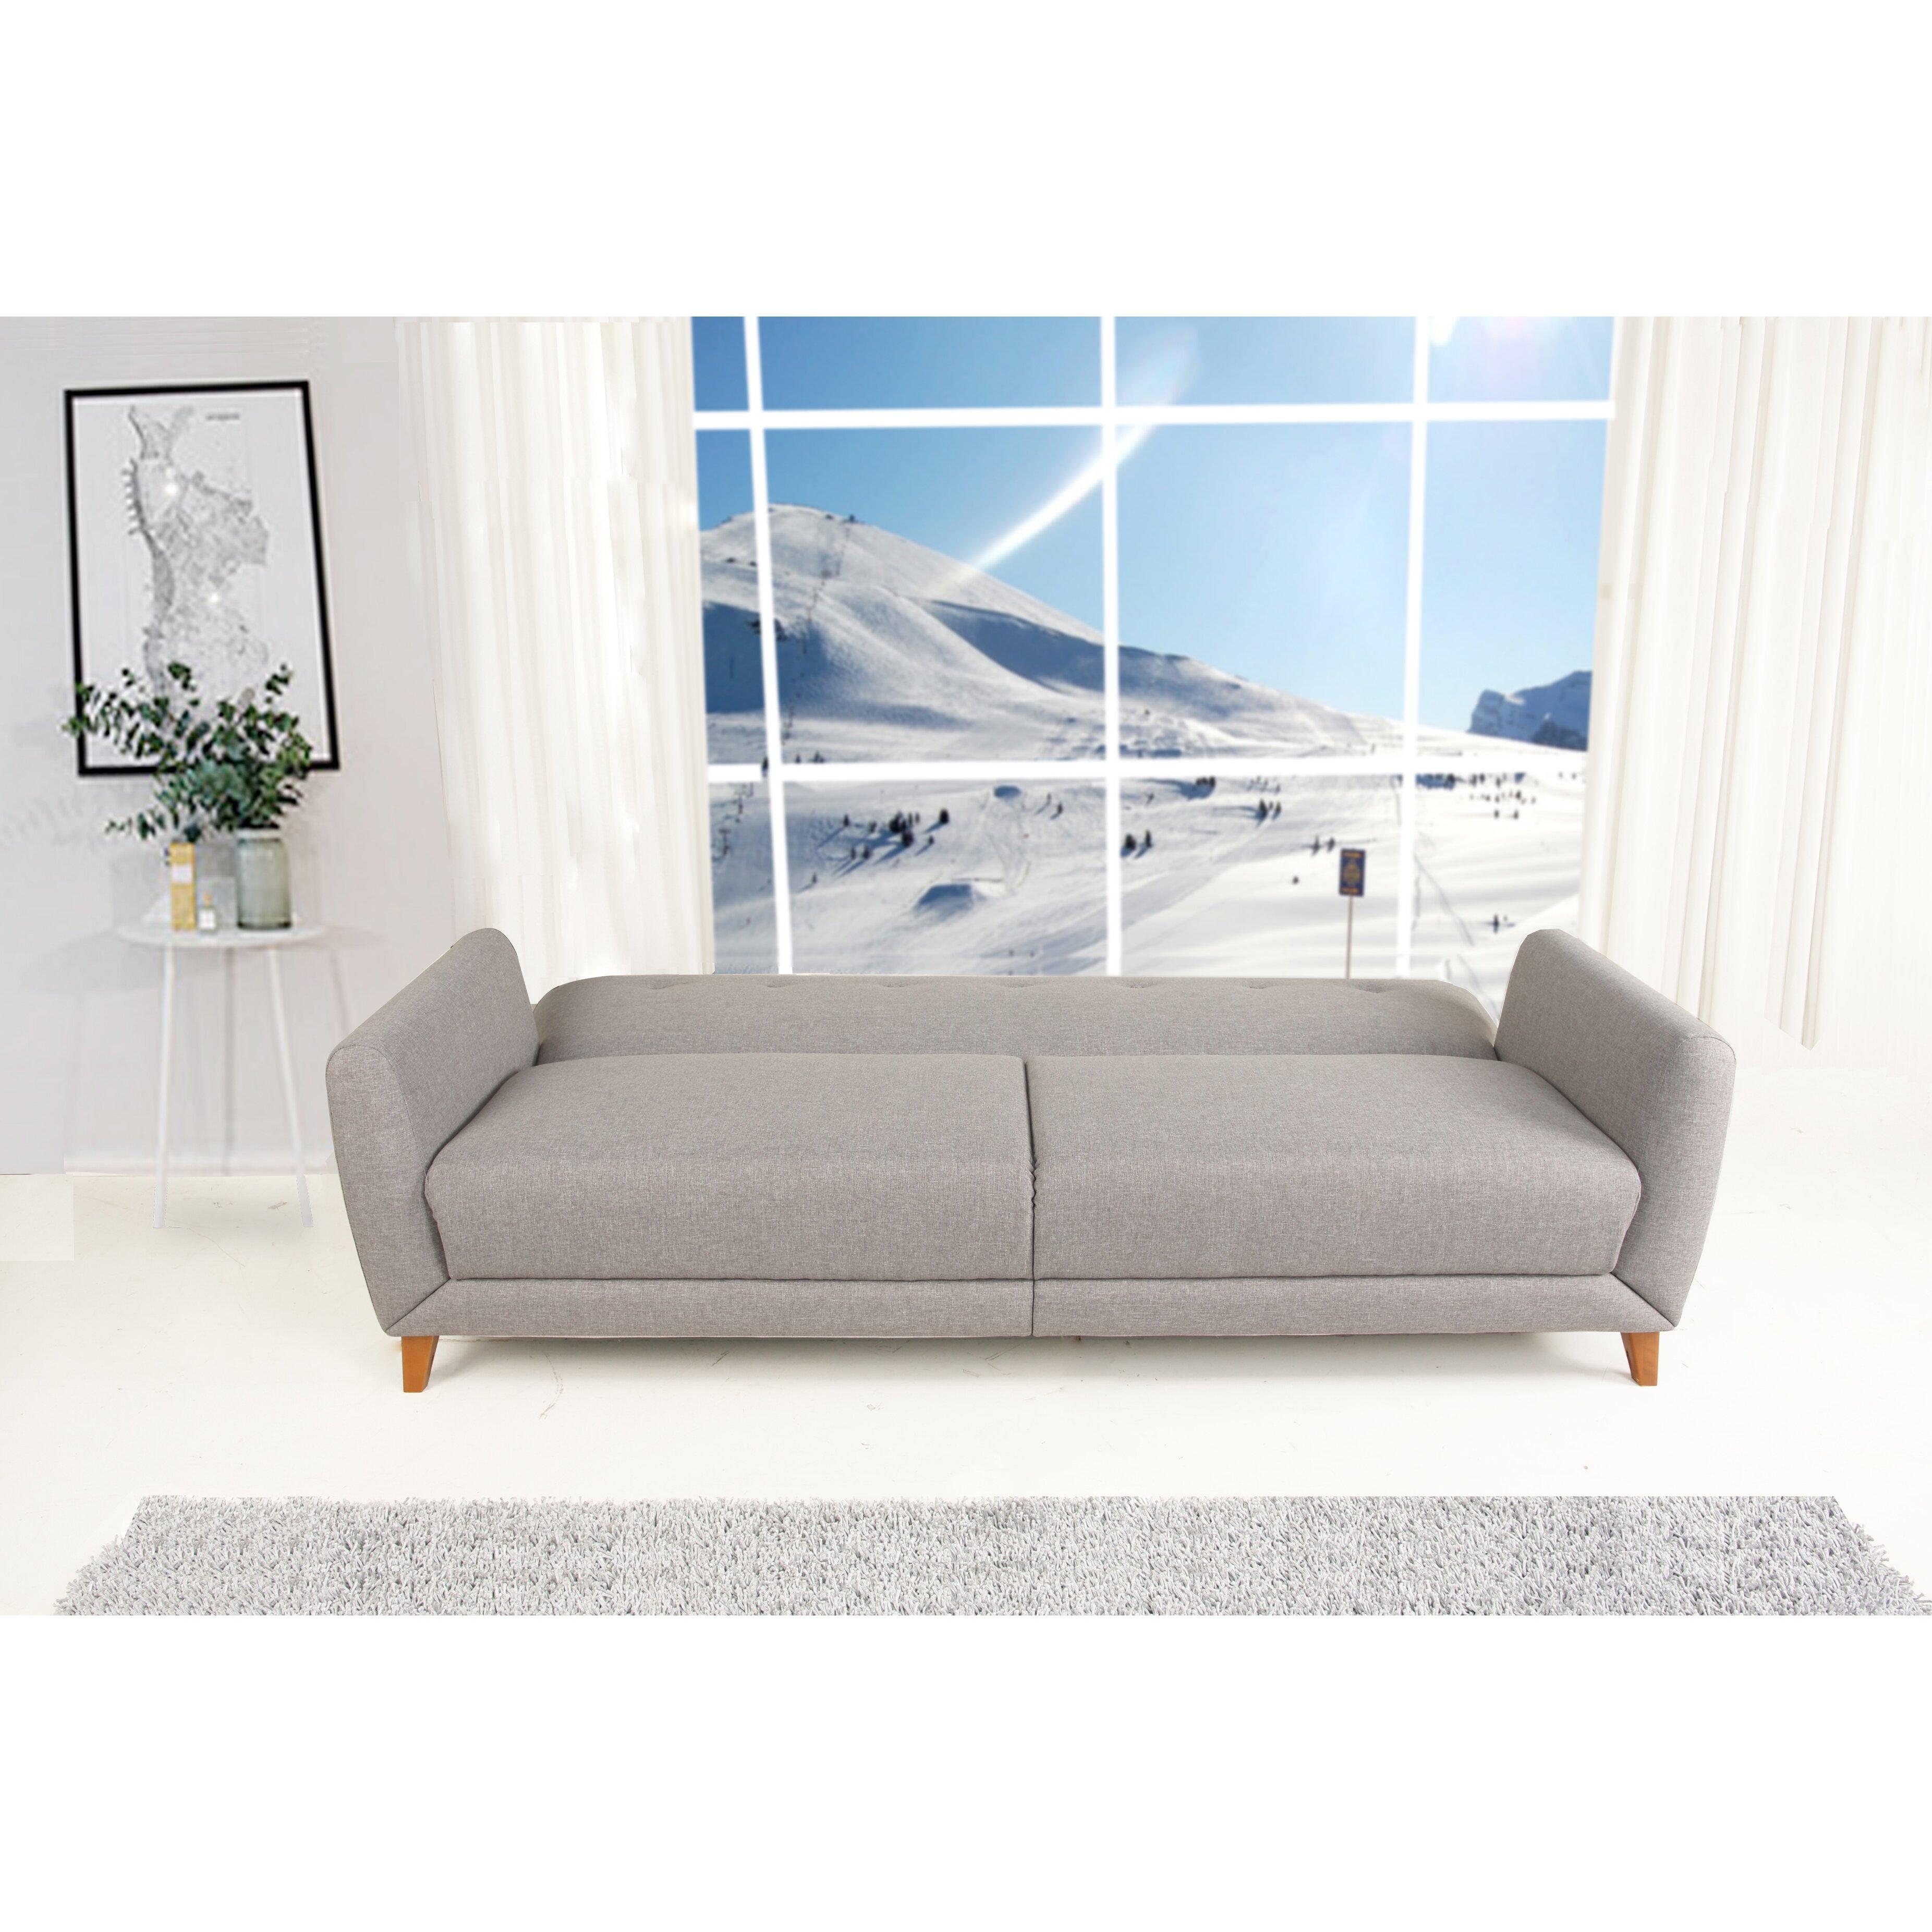 Designer Sofa Beds Sydney Refil Sofa